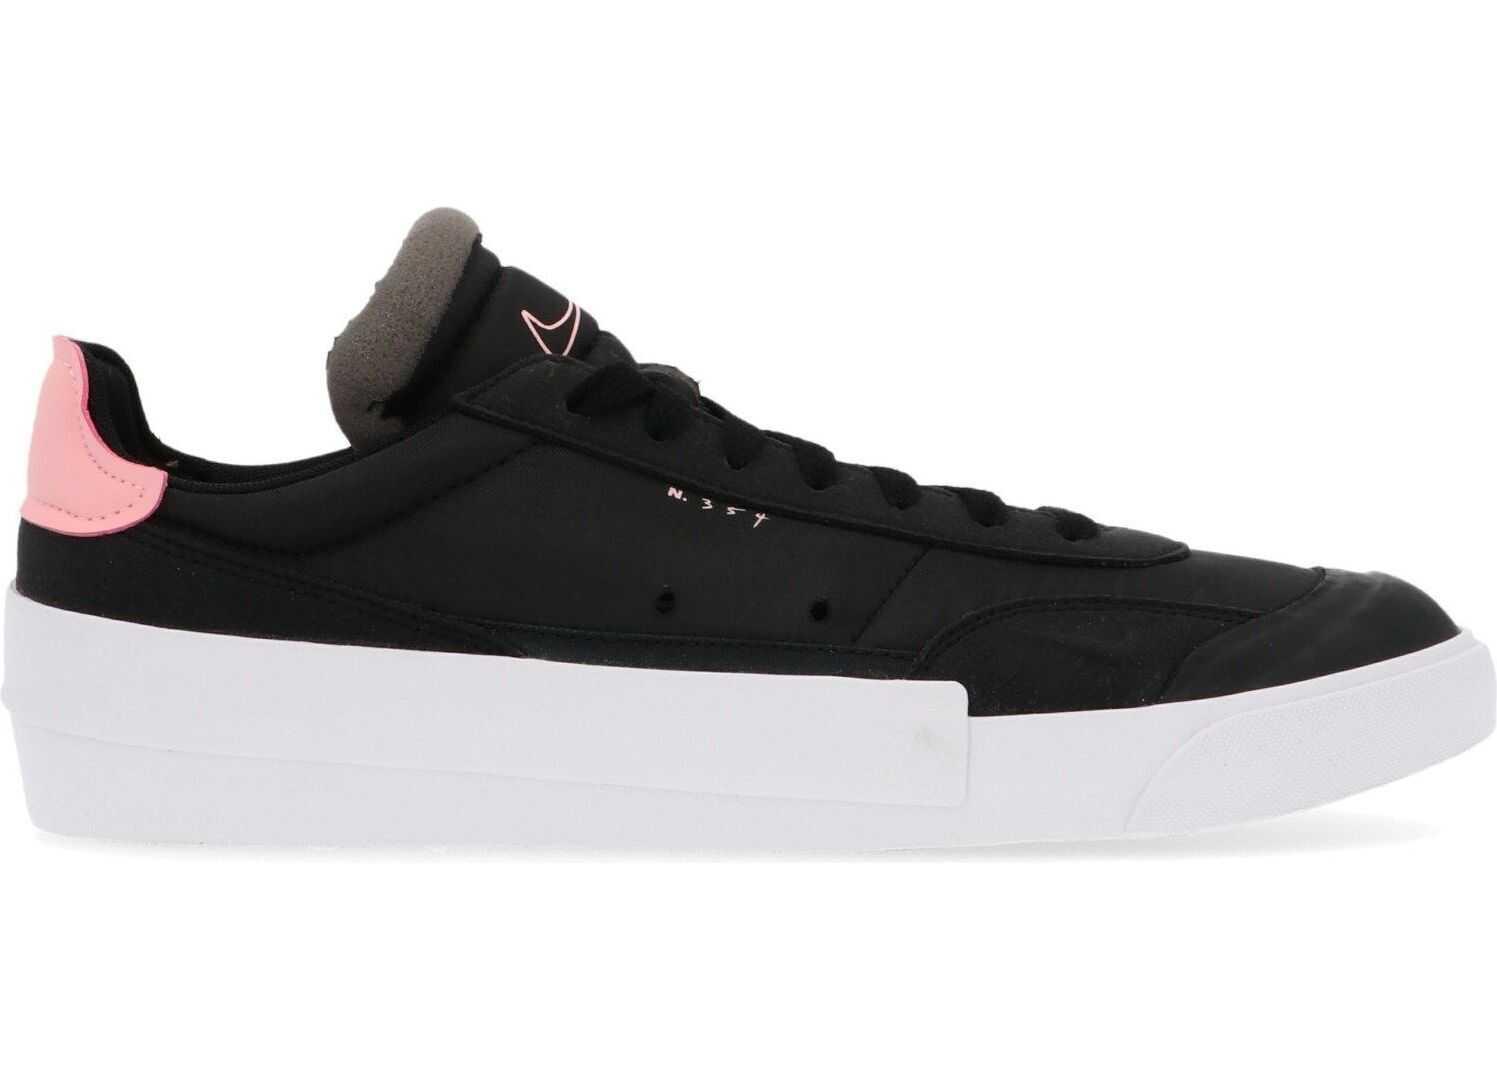 Nike NIKE DROP-TYPE BLACK